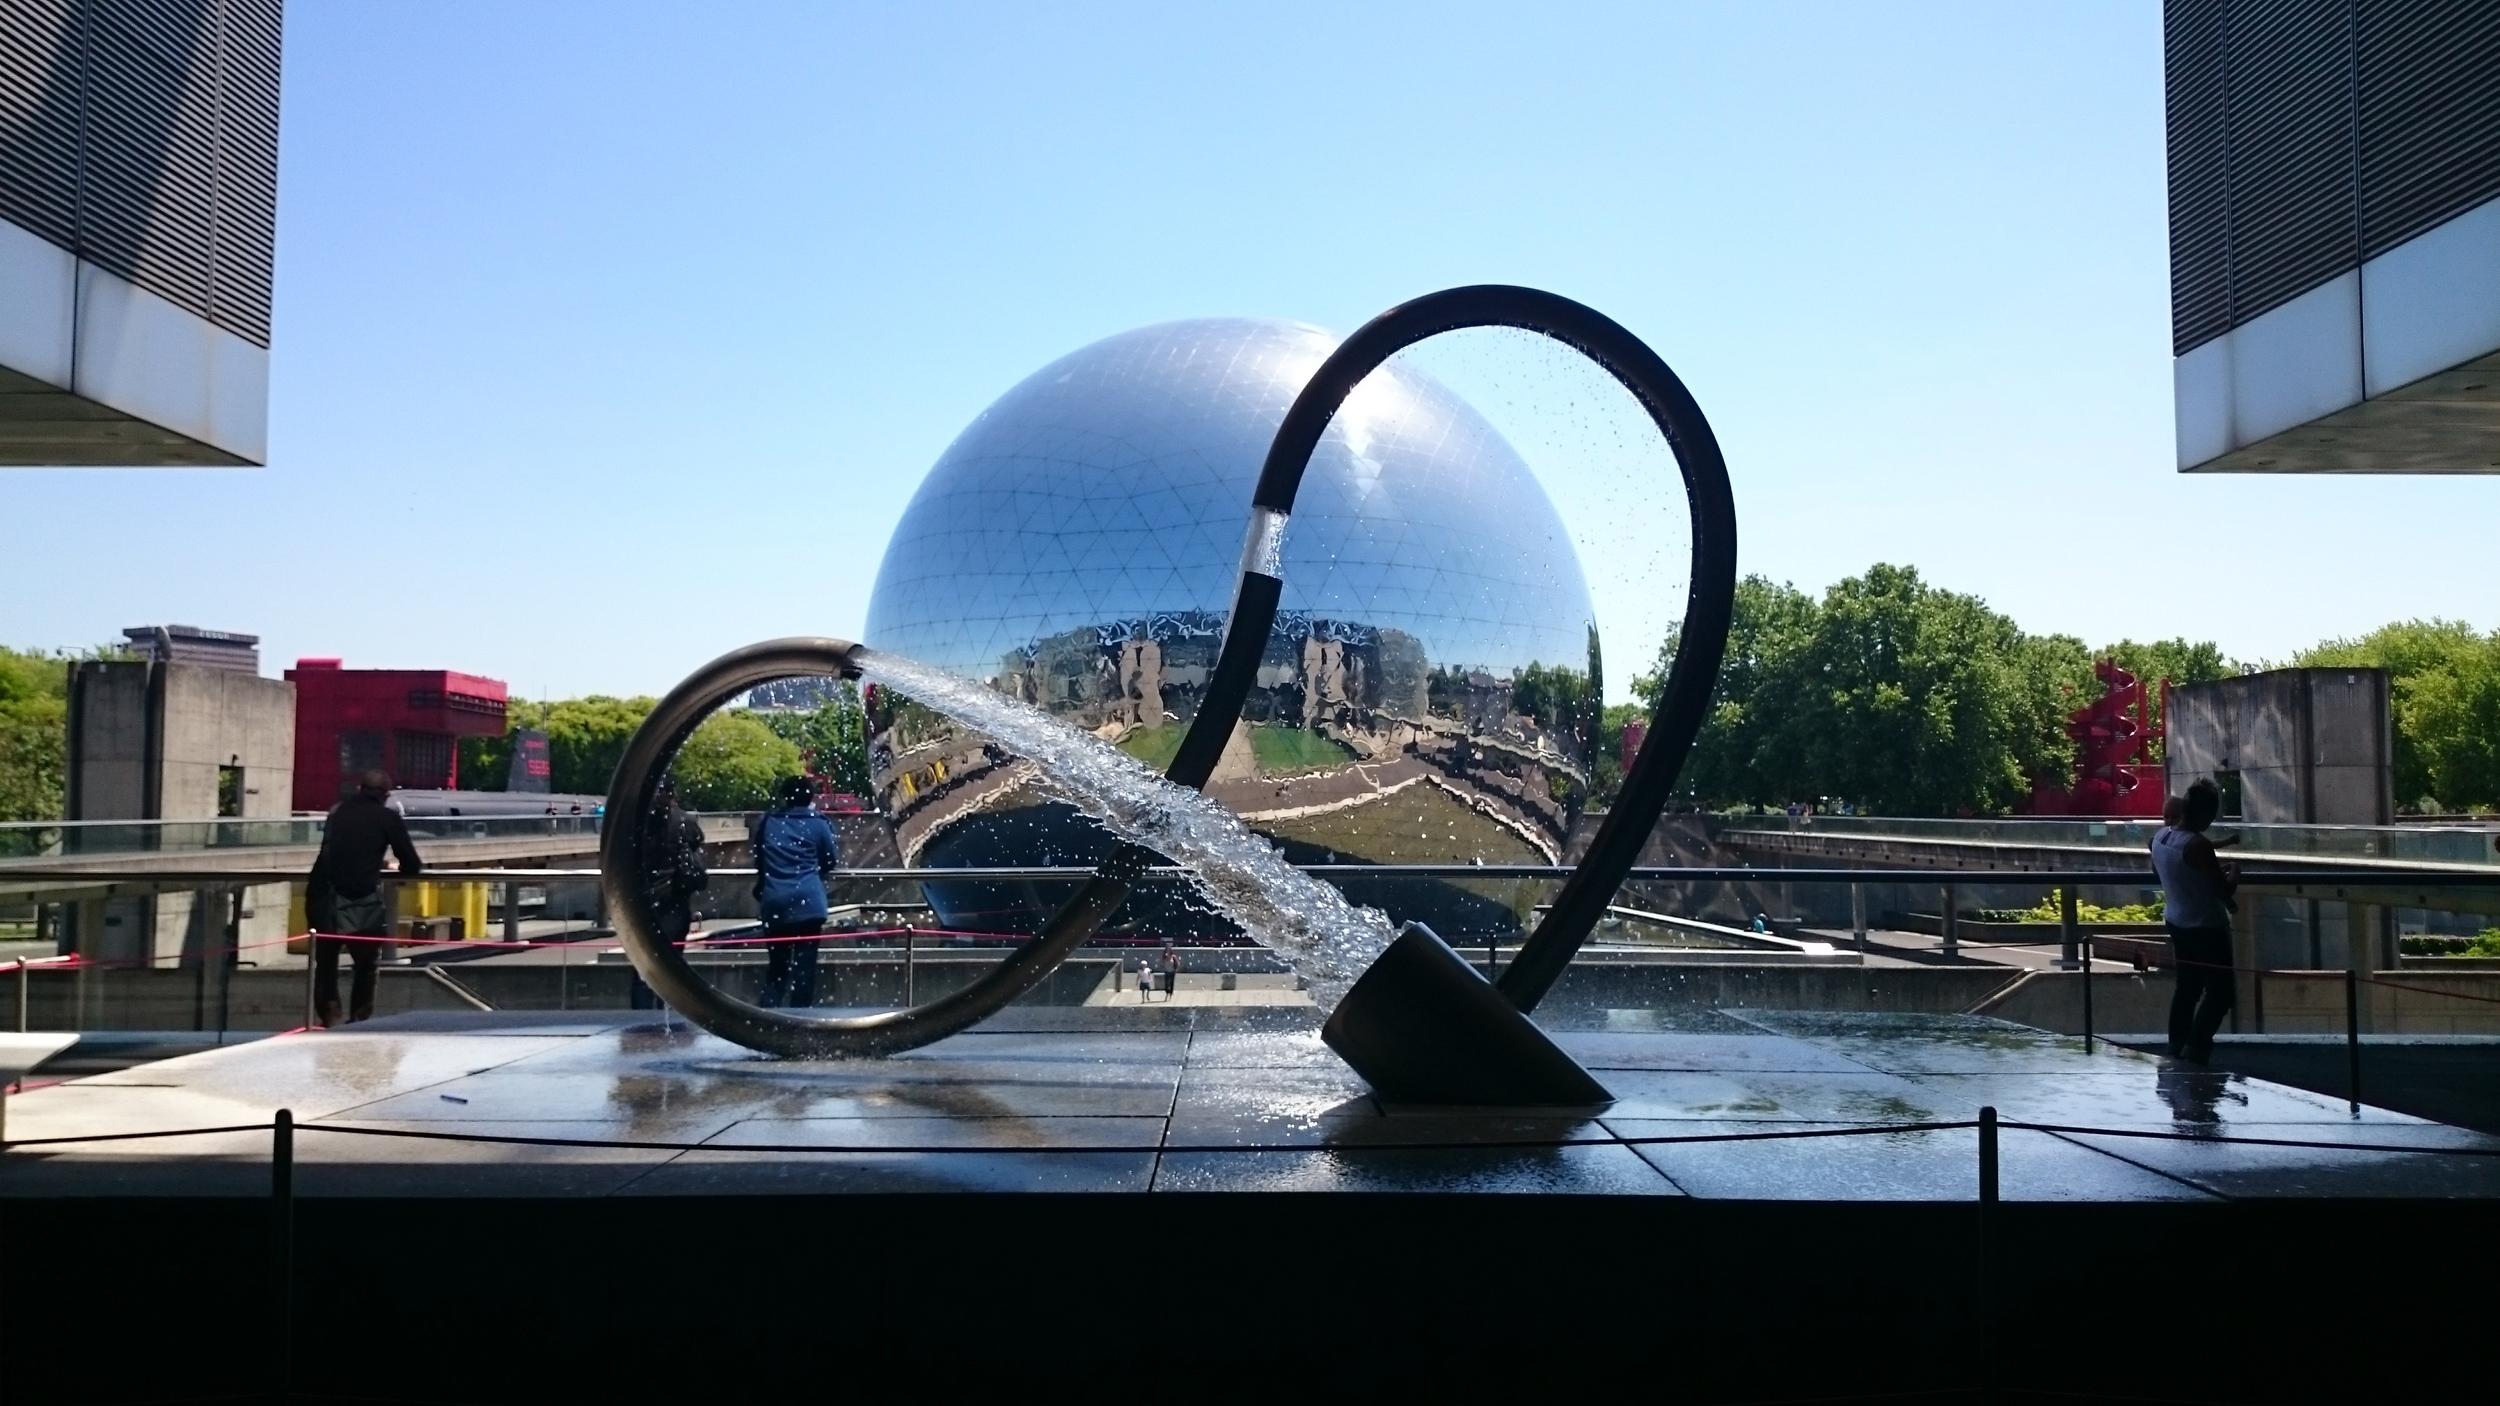 Huge reflective Ball